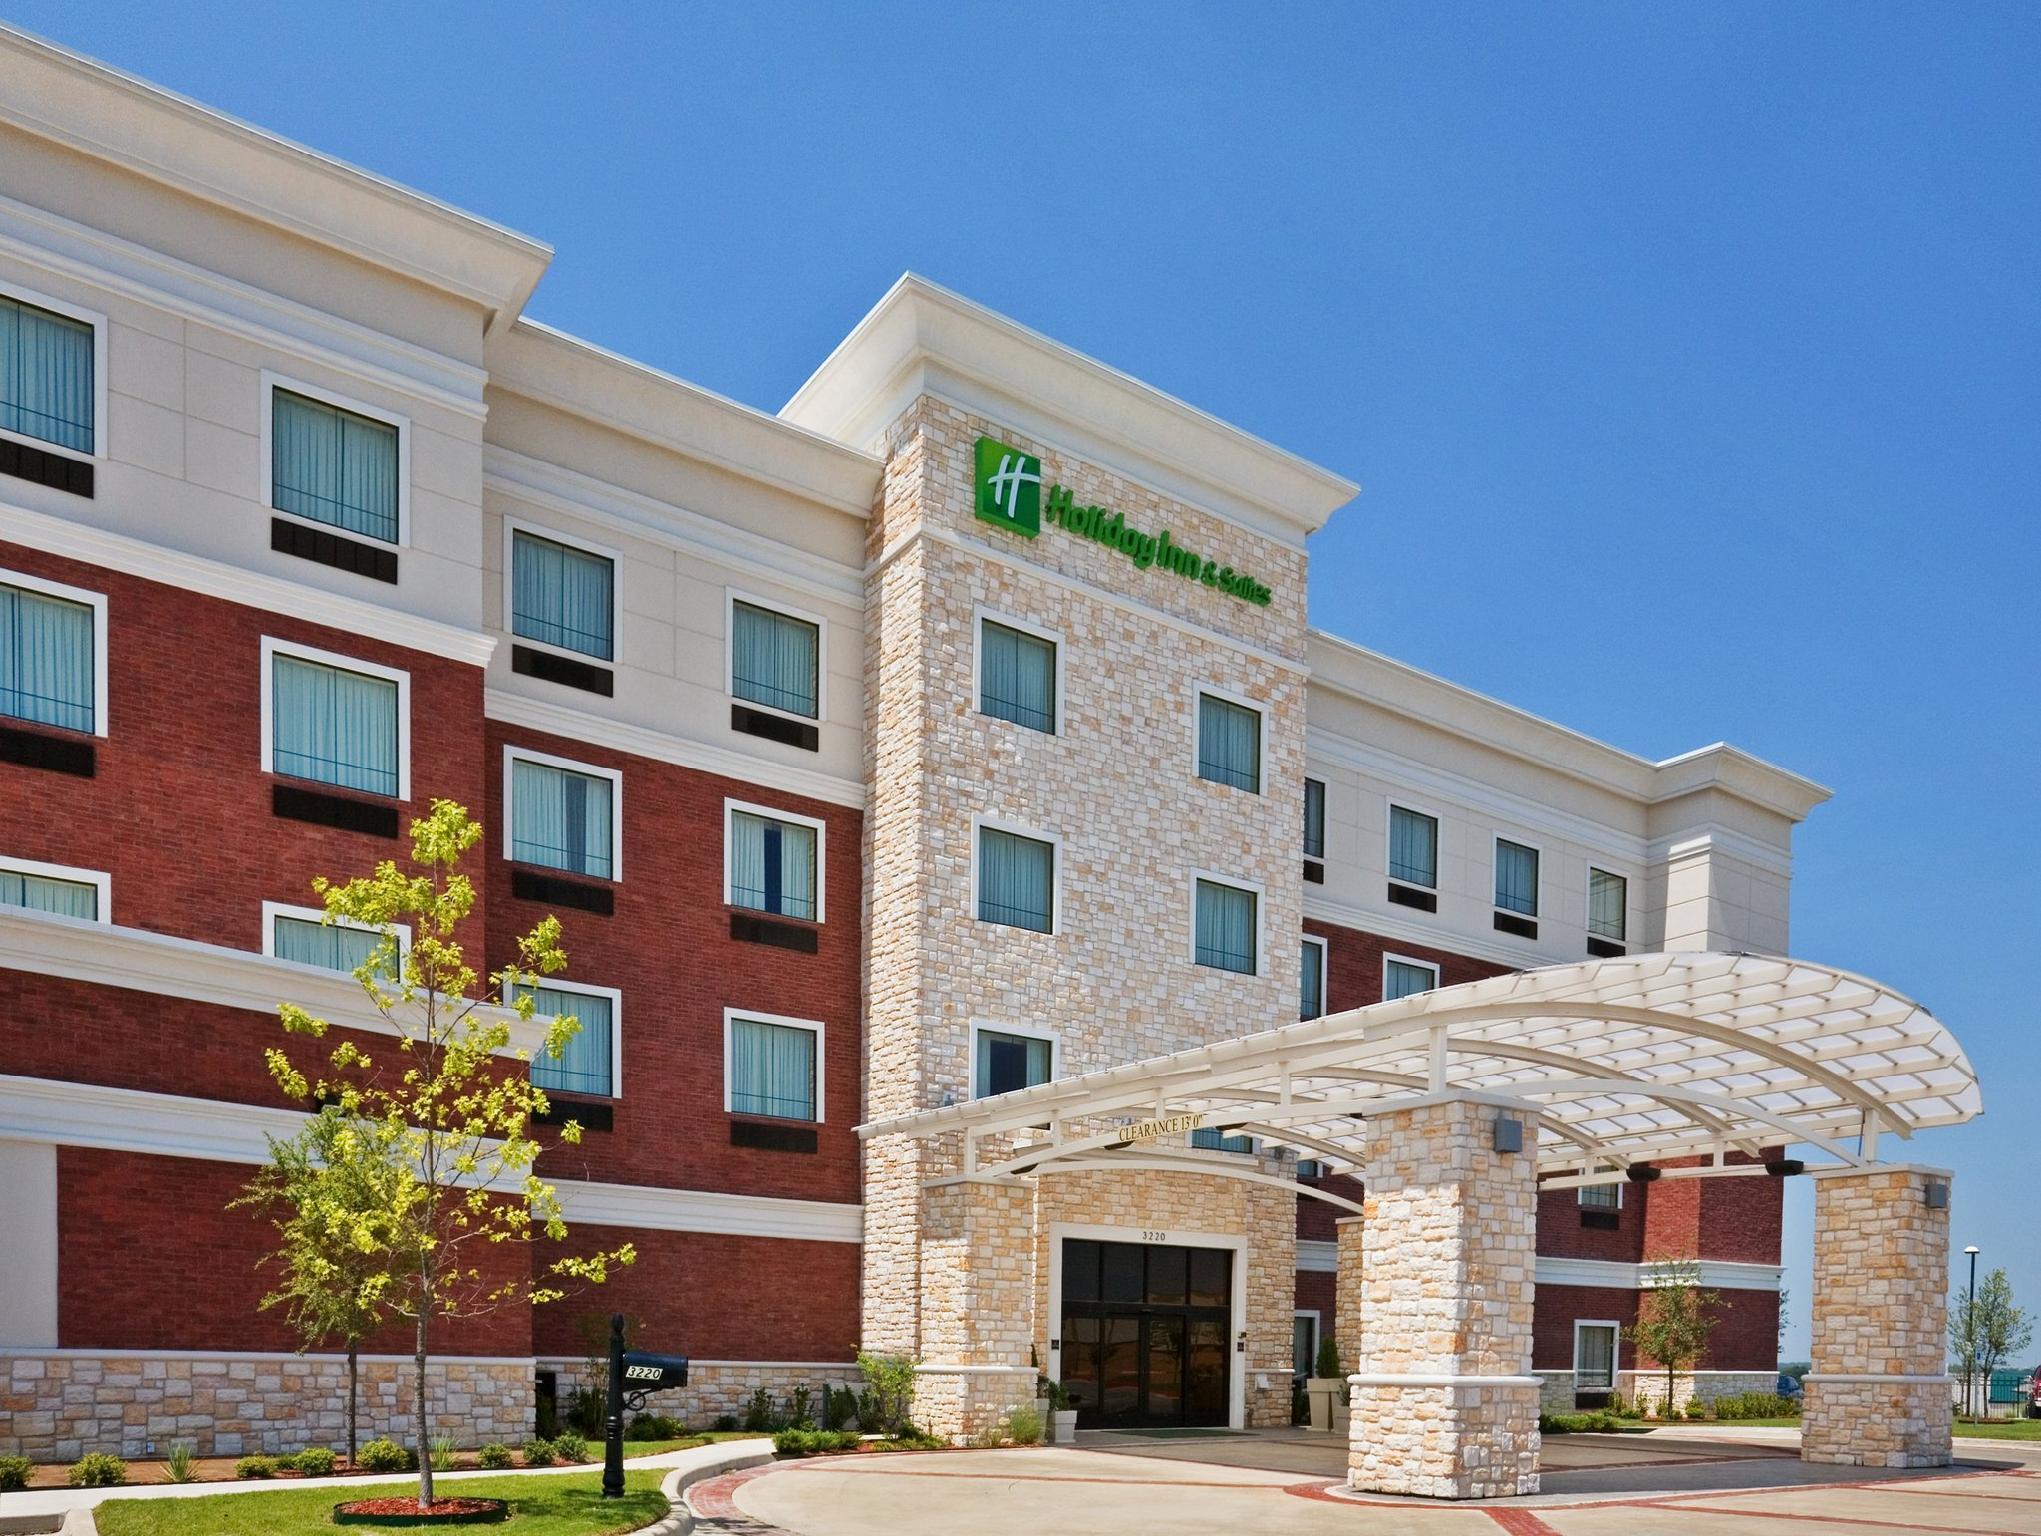 Holiday Inn And Suites McKinney   Allen